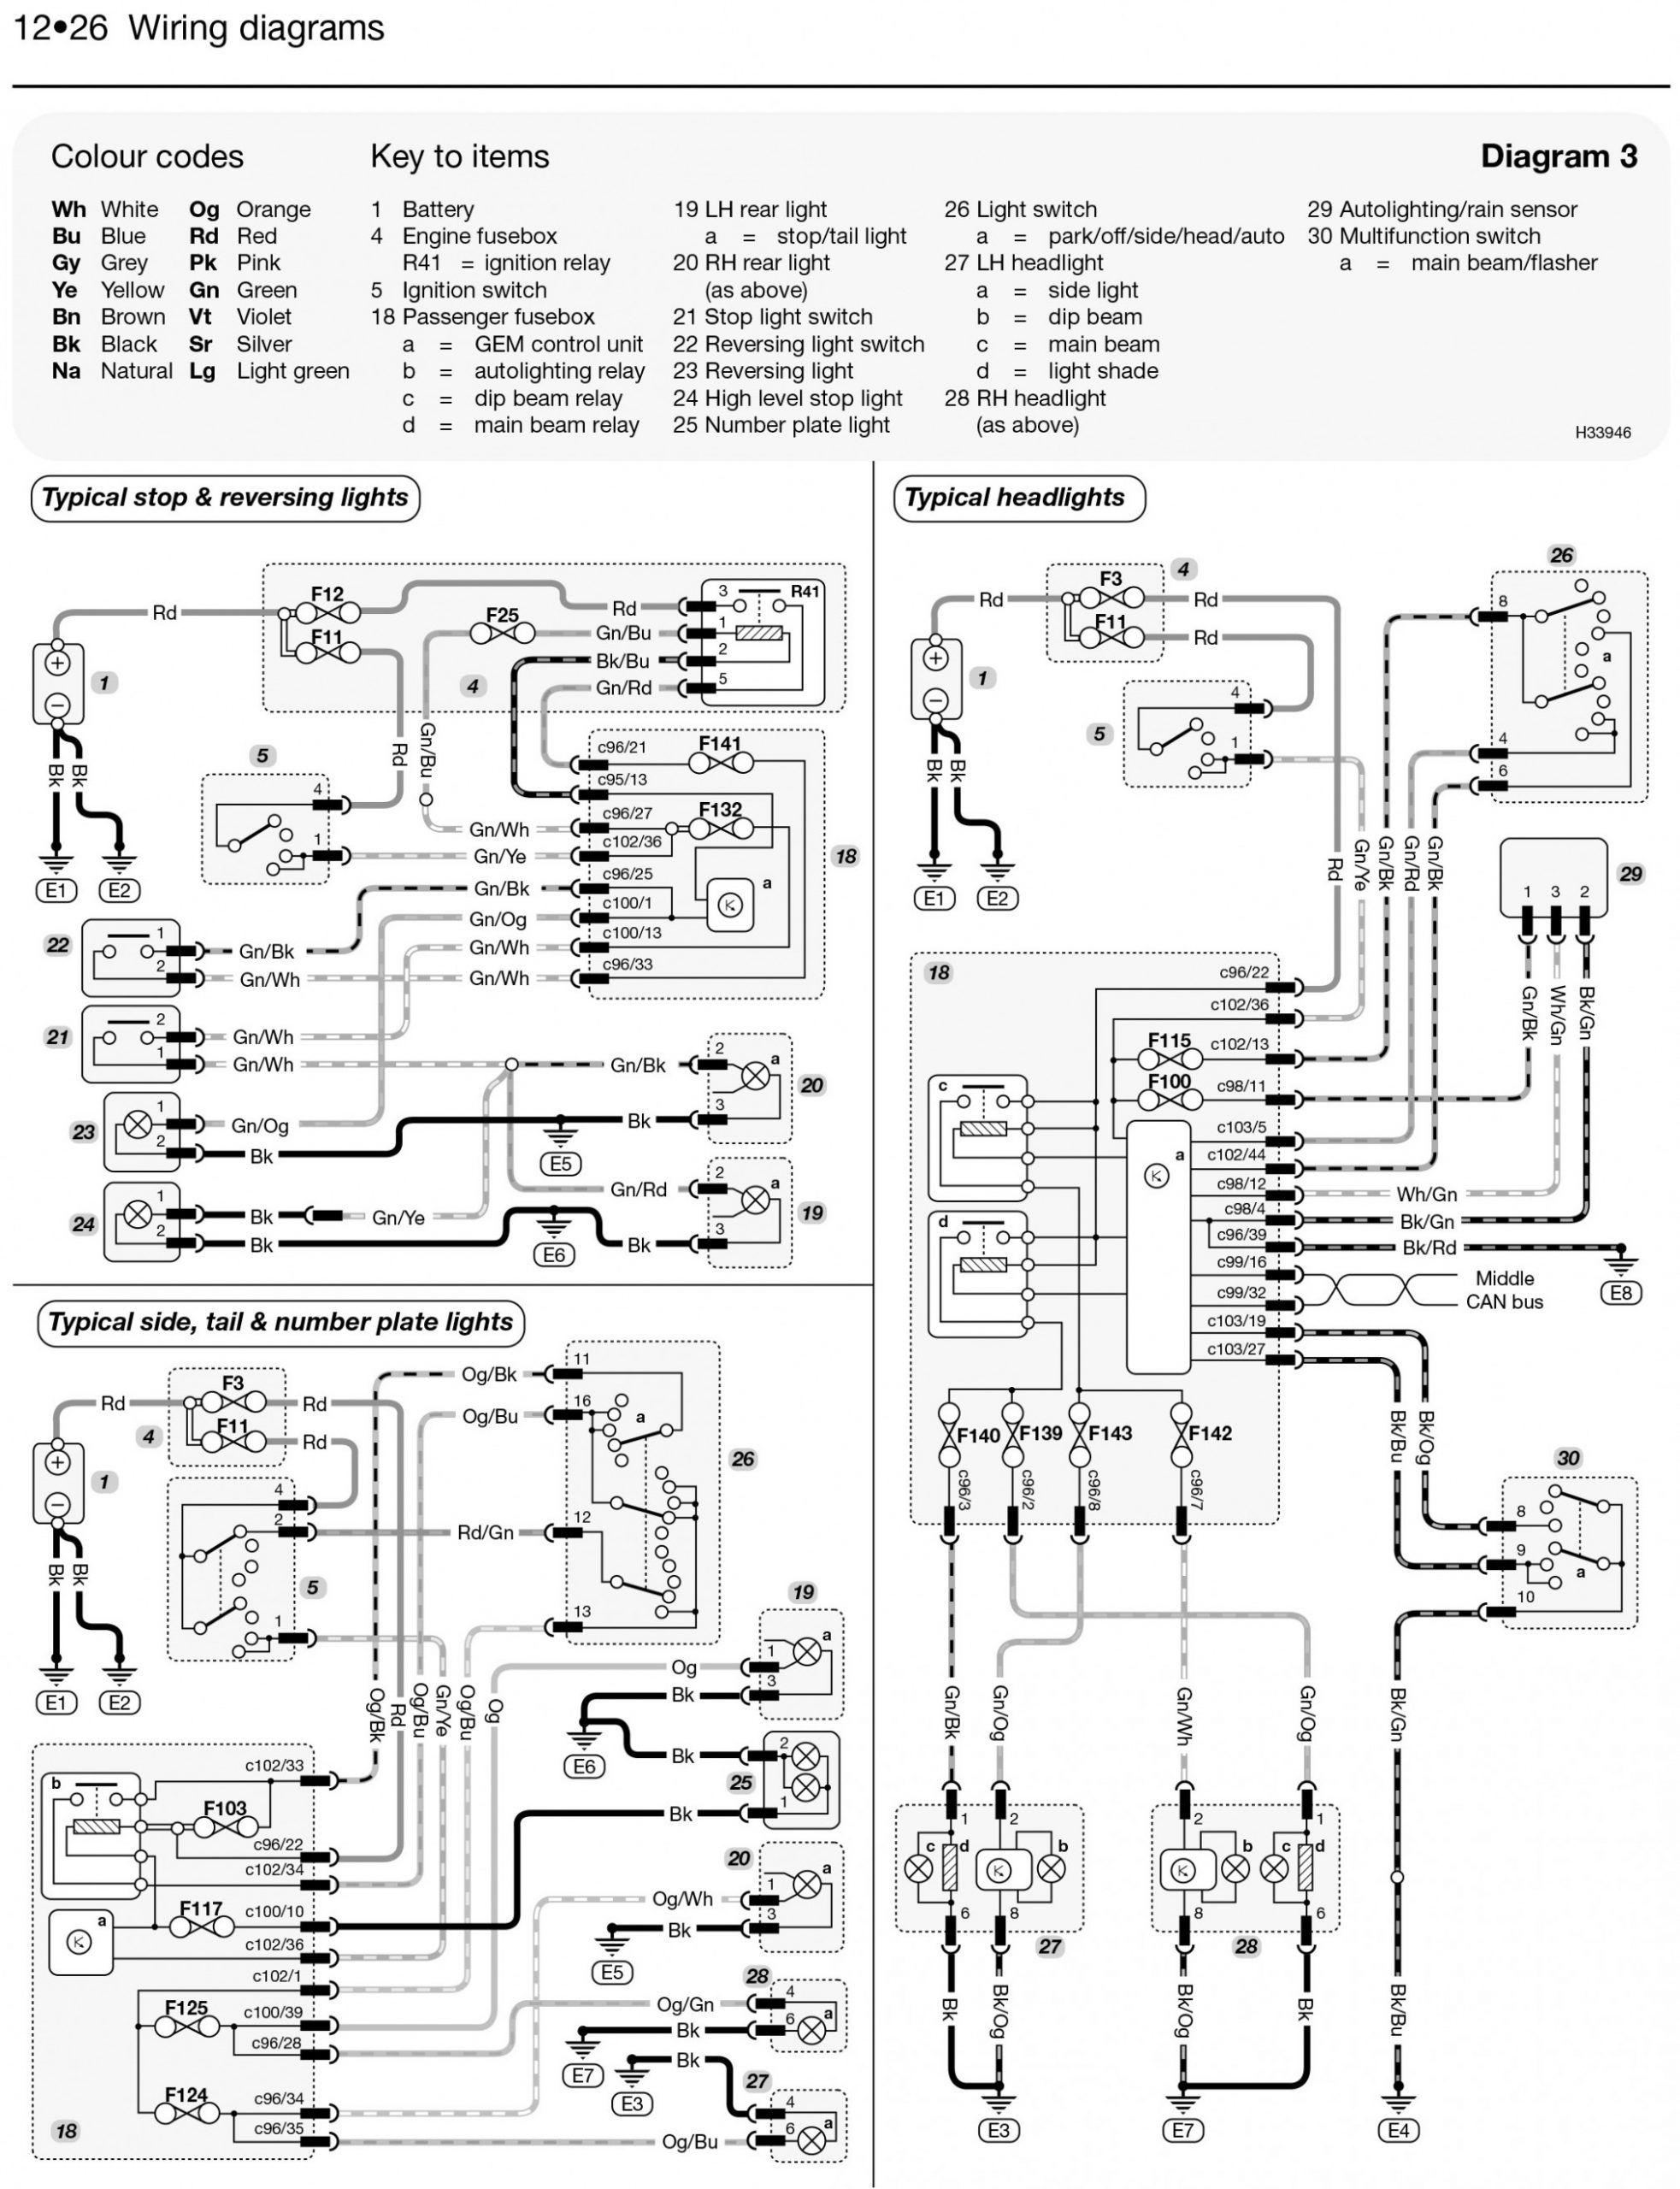 2000 Ford Focus Airbag Wiring Diagram Gota Wiring Diagram